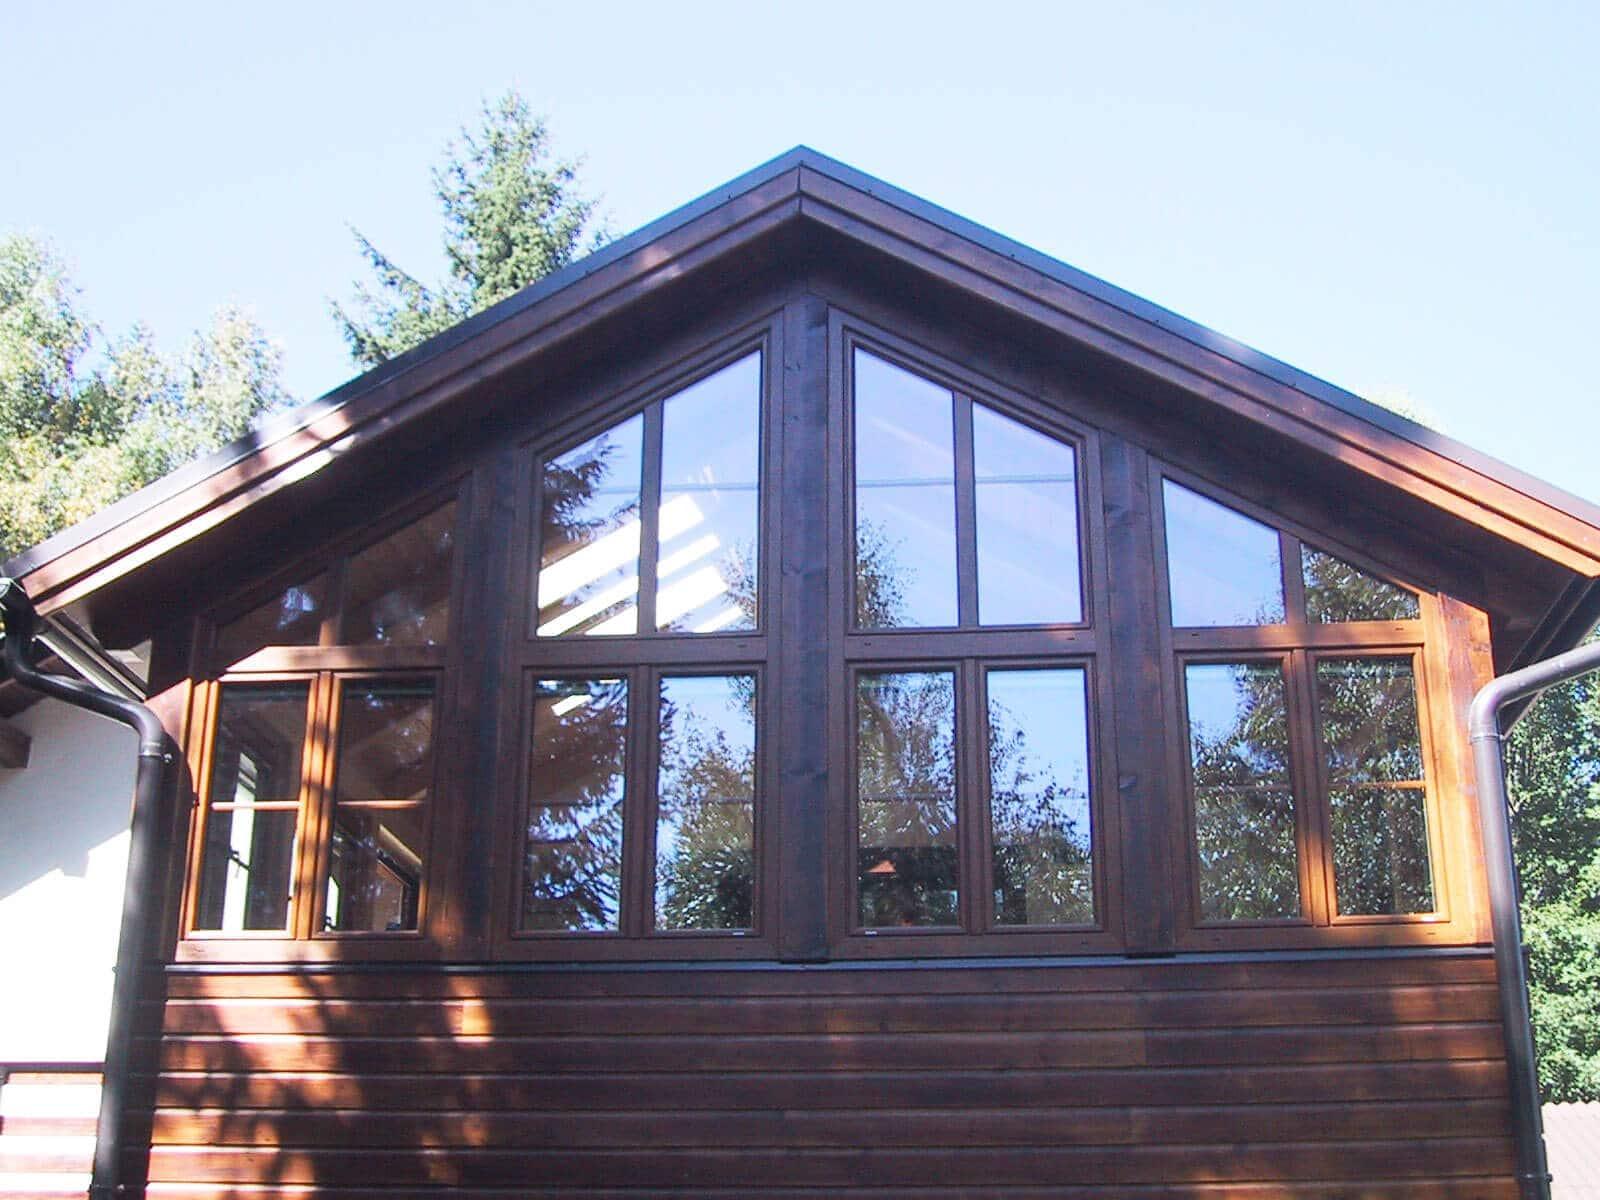 Balkonuberdachung Alu Terrassenuberdachung Aus Aluminium And Glas